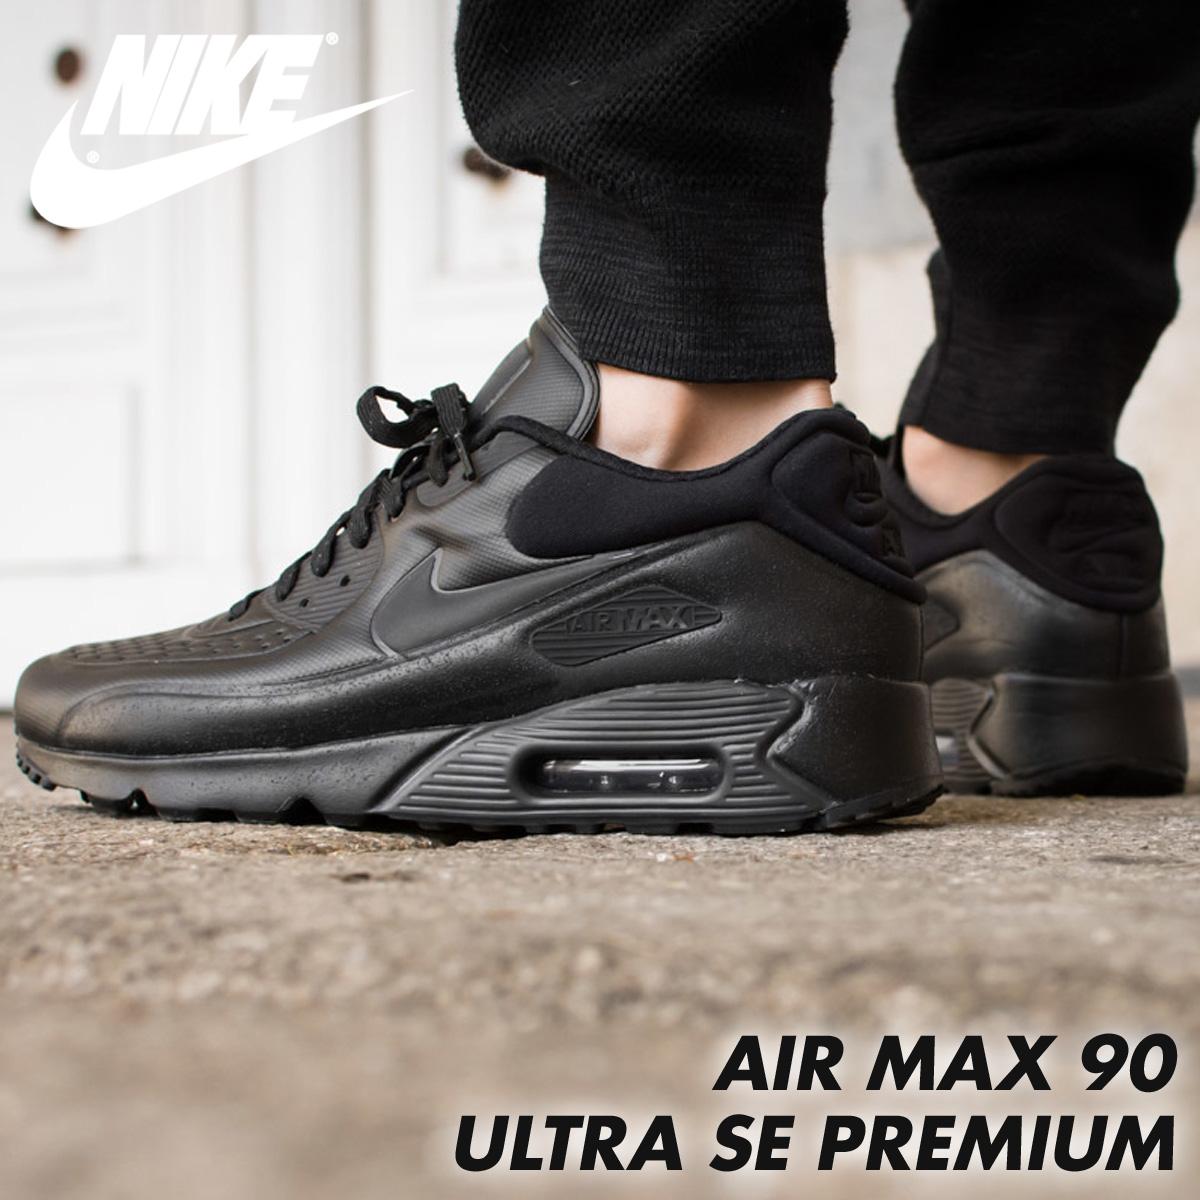 85206a0af8e0 ... Nike NIKE Air Max 90 ultra SE men sneakers AIR MAX 90 SE ULTRA PREMIUM  858